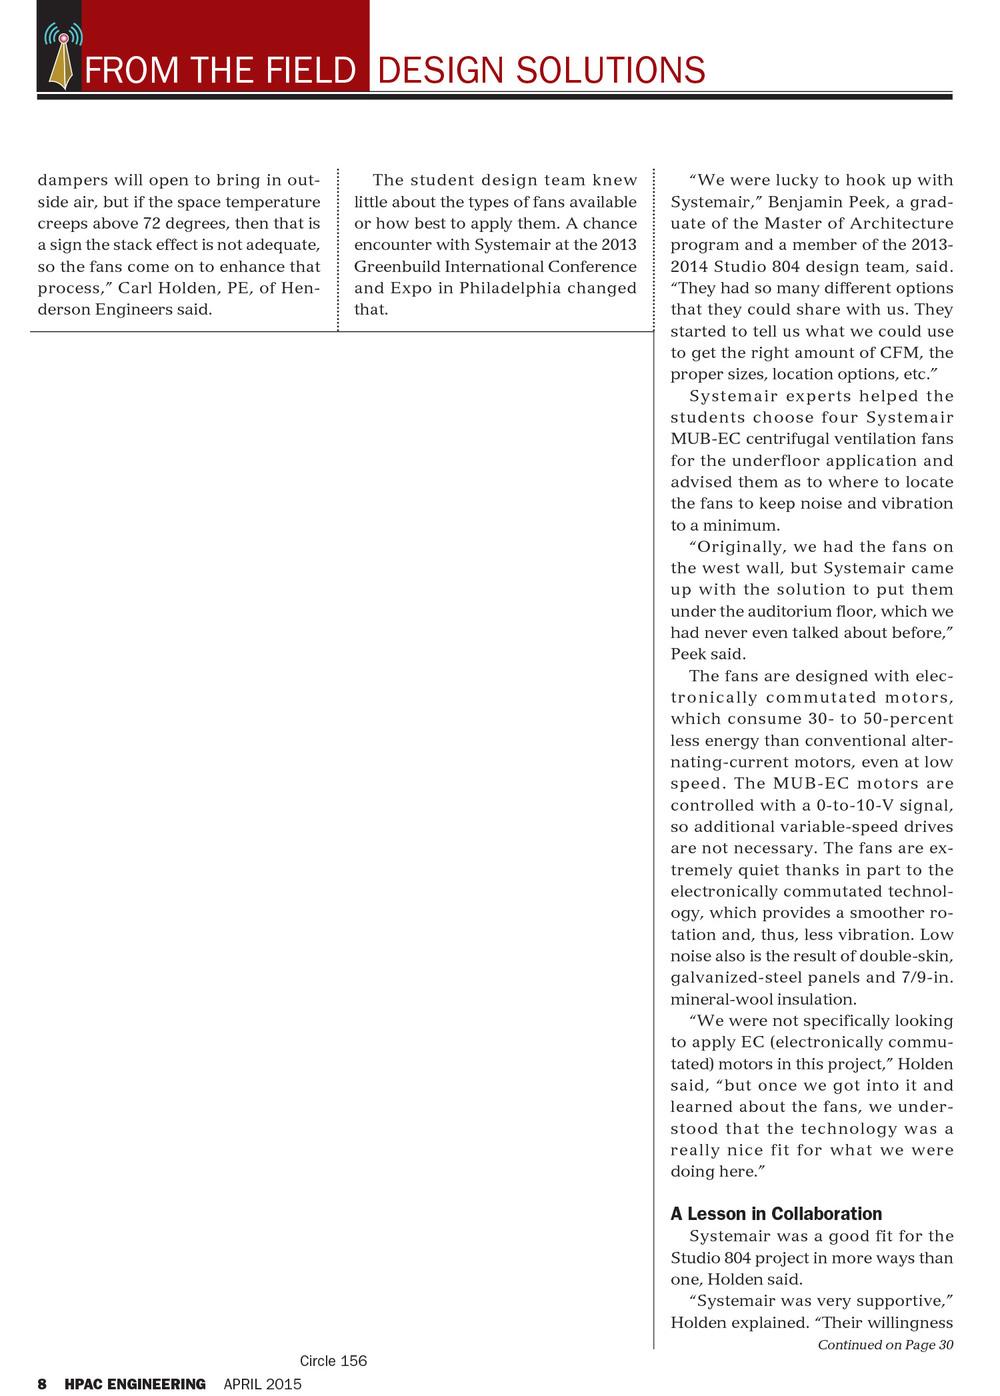 trish-holder-feature-article-hvac-marketing-communications-portfolio-6-page-2.jpg